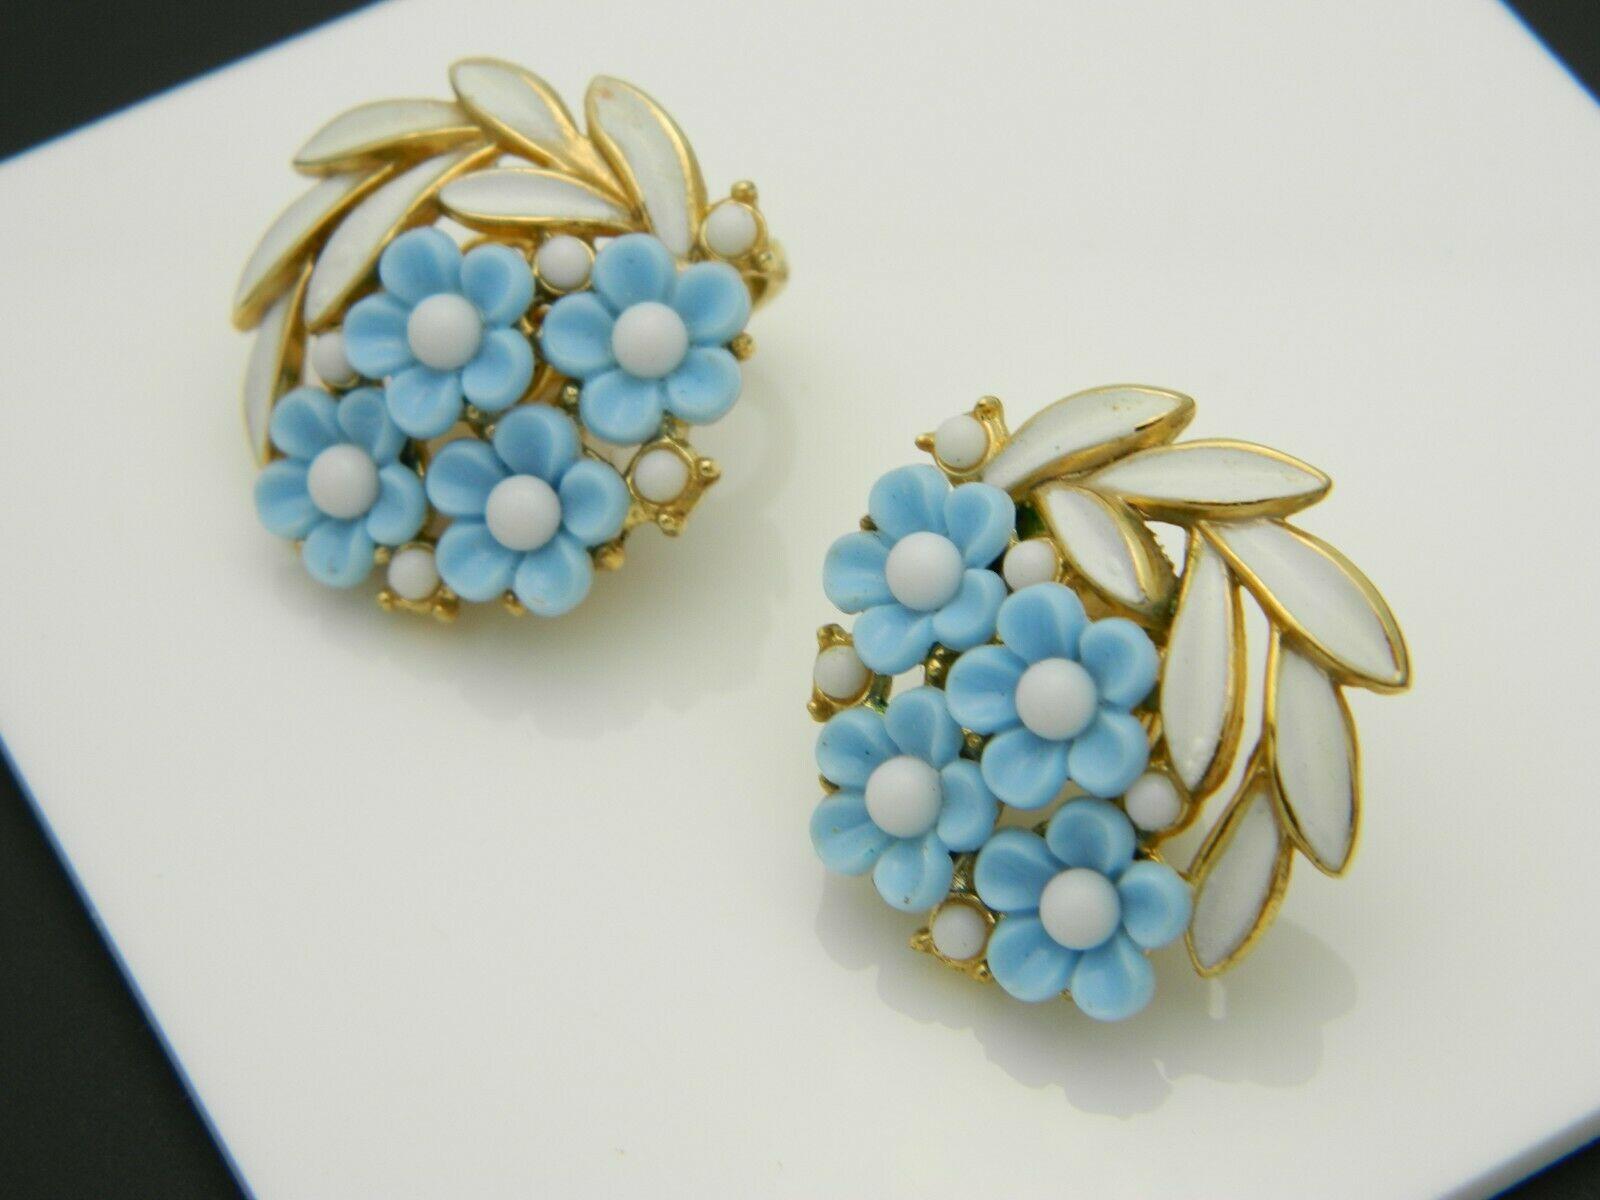 Crown Trifari Blue Lucite White Enamel Flower Floral Gold Tone Clip Earrings